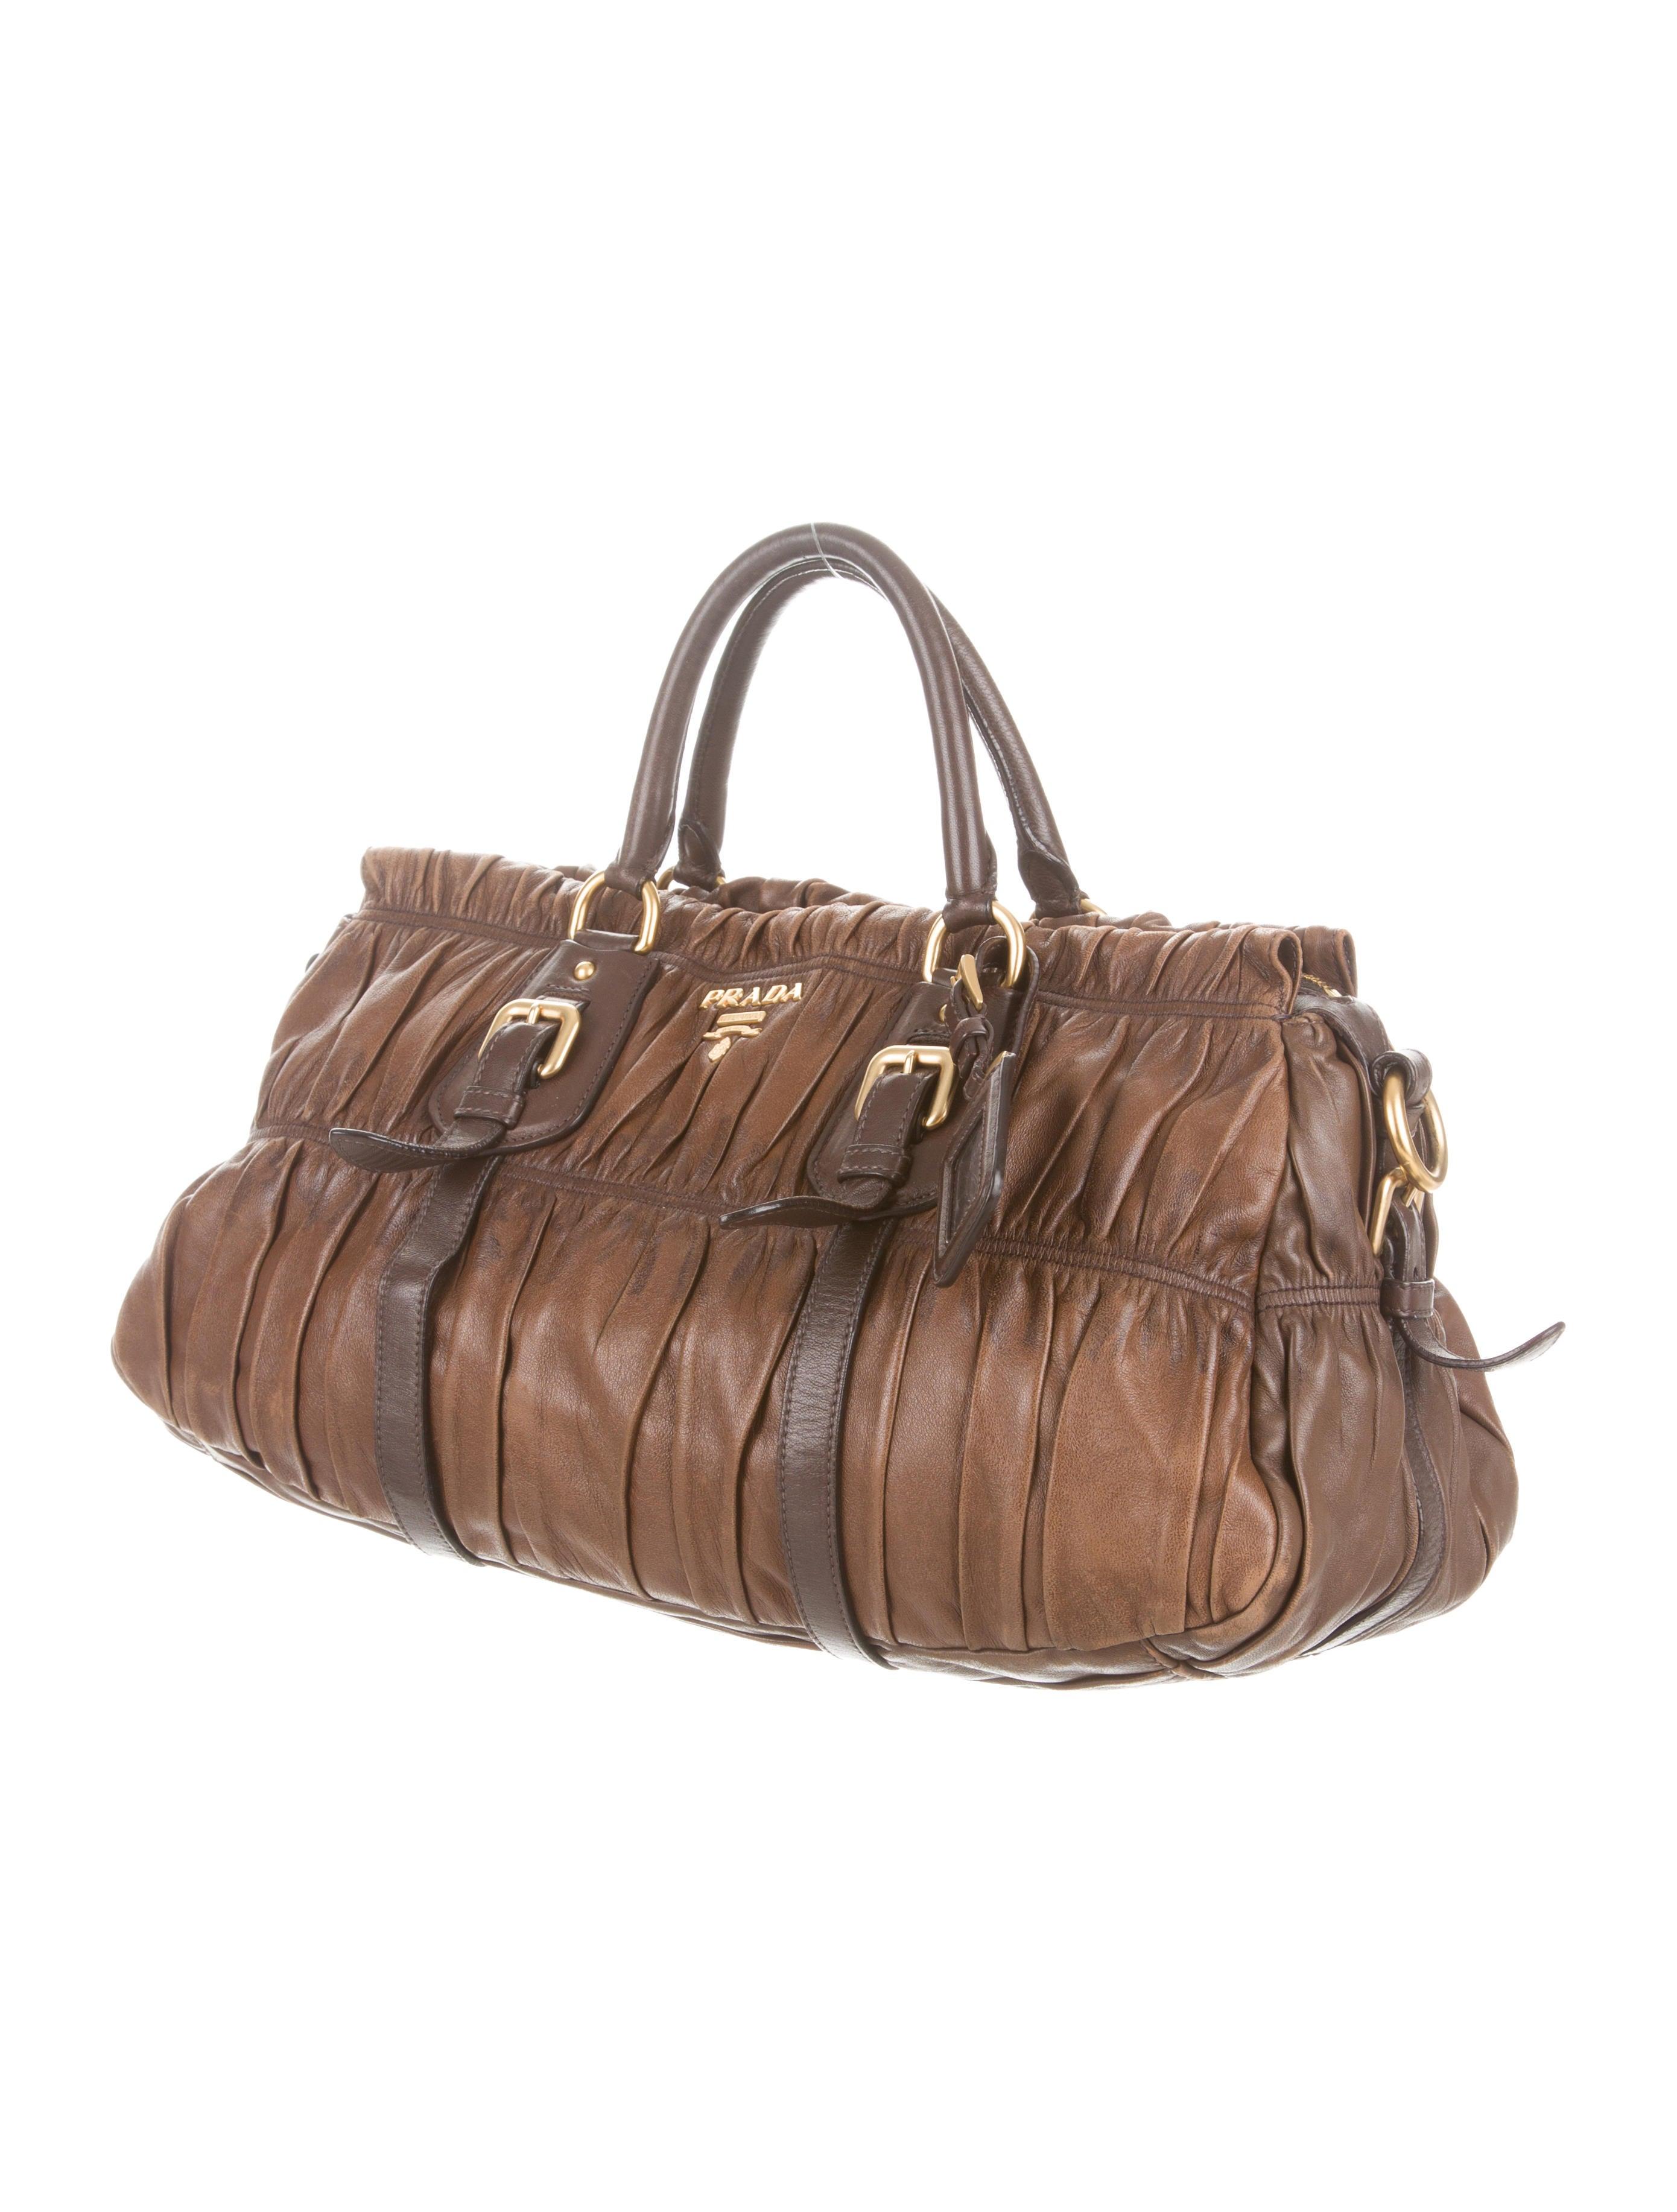 Prada Nappa Gaufre Satchel - Handbags - PRA81589 | The RealReal